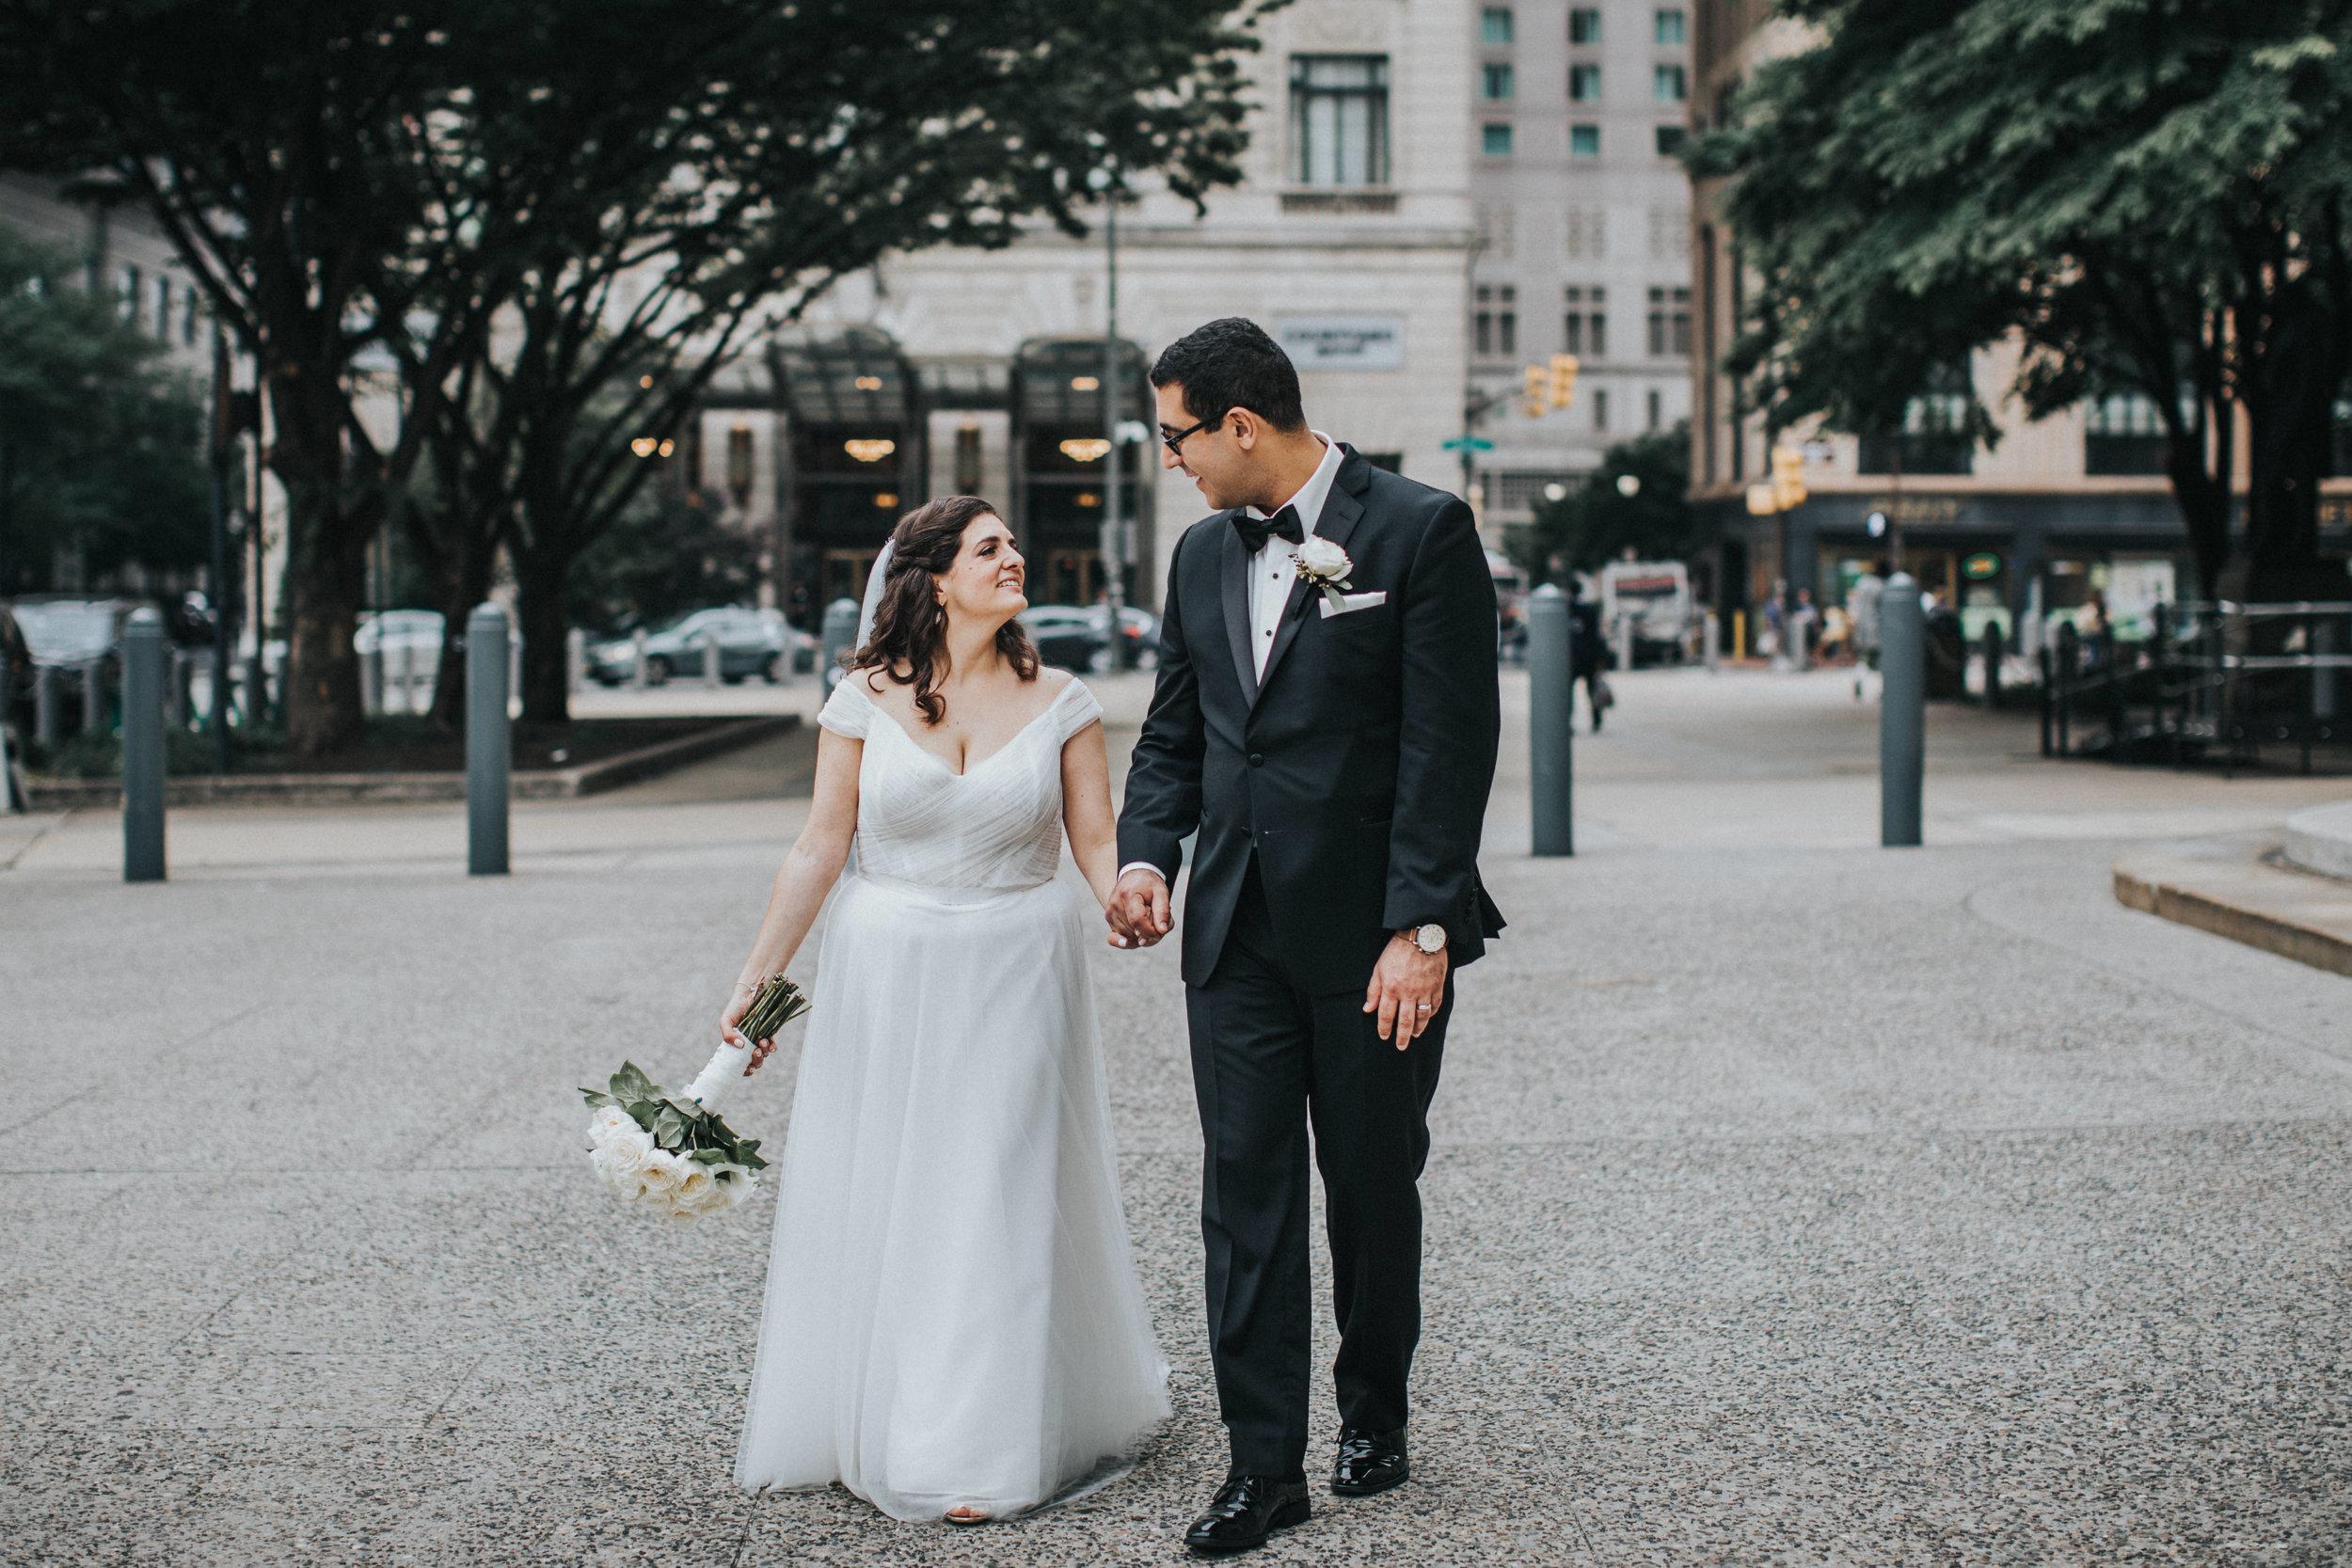 JennaLynnPhotography-NJWeddingPhotographer-Philadelphia-Wedding-ArtsBallroom-BridalParty-18.jpg